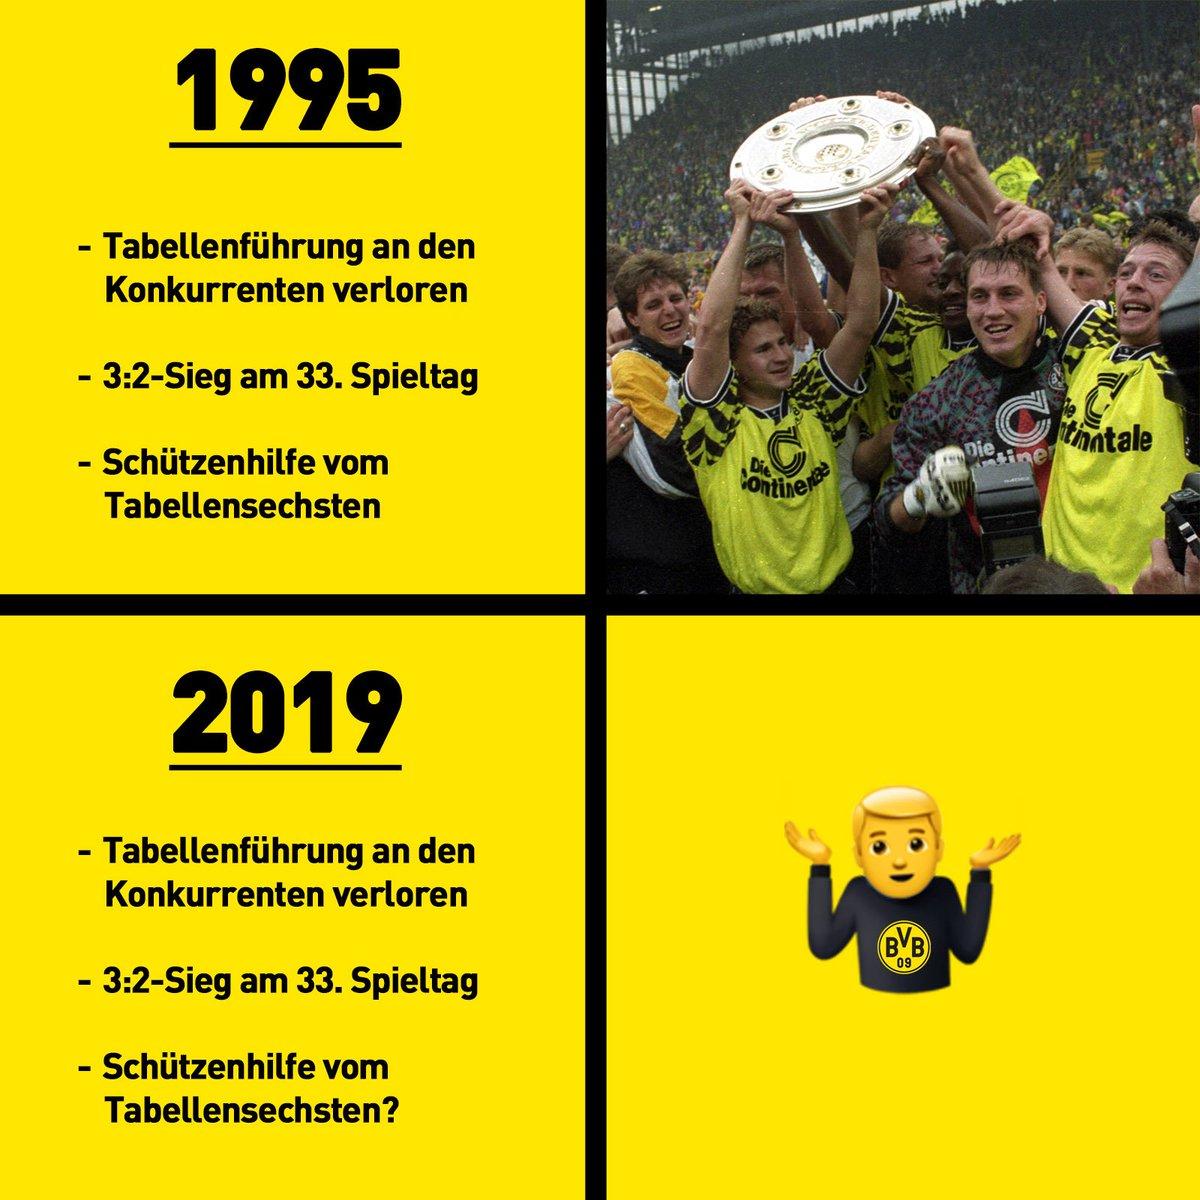 Borussia Dortmund Bvb Twitter